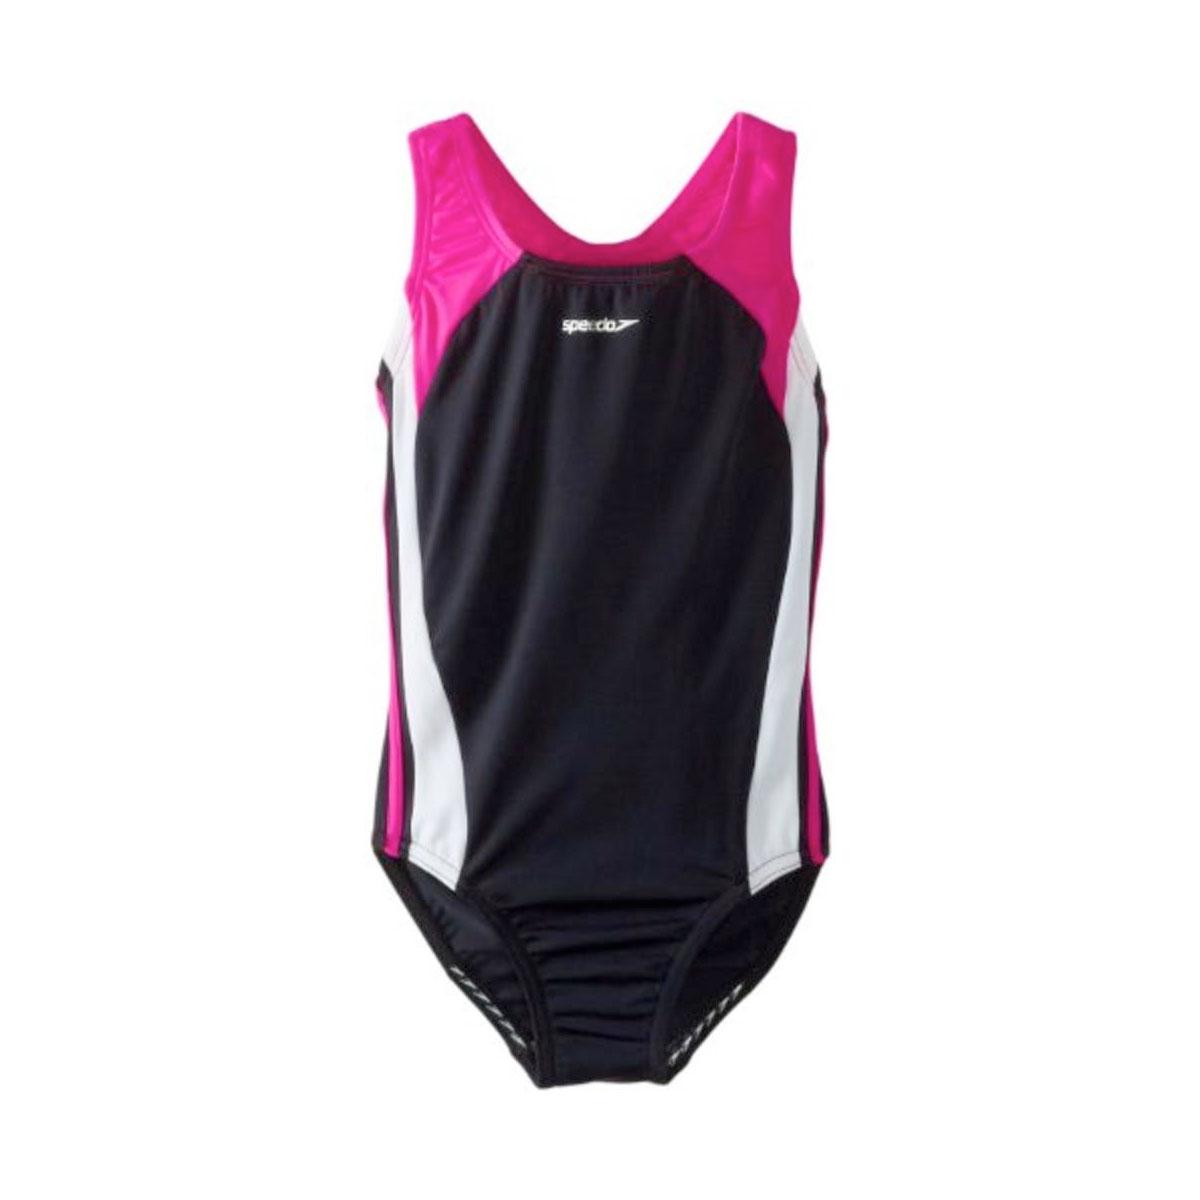 Girls' Swimsuit One Piece Infinity Splice Swimsuit, Black/Pink, swatch